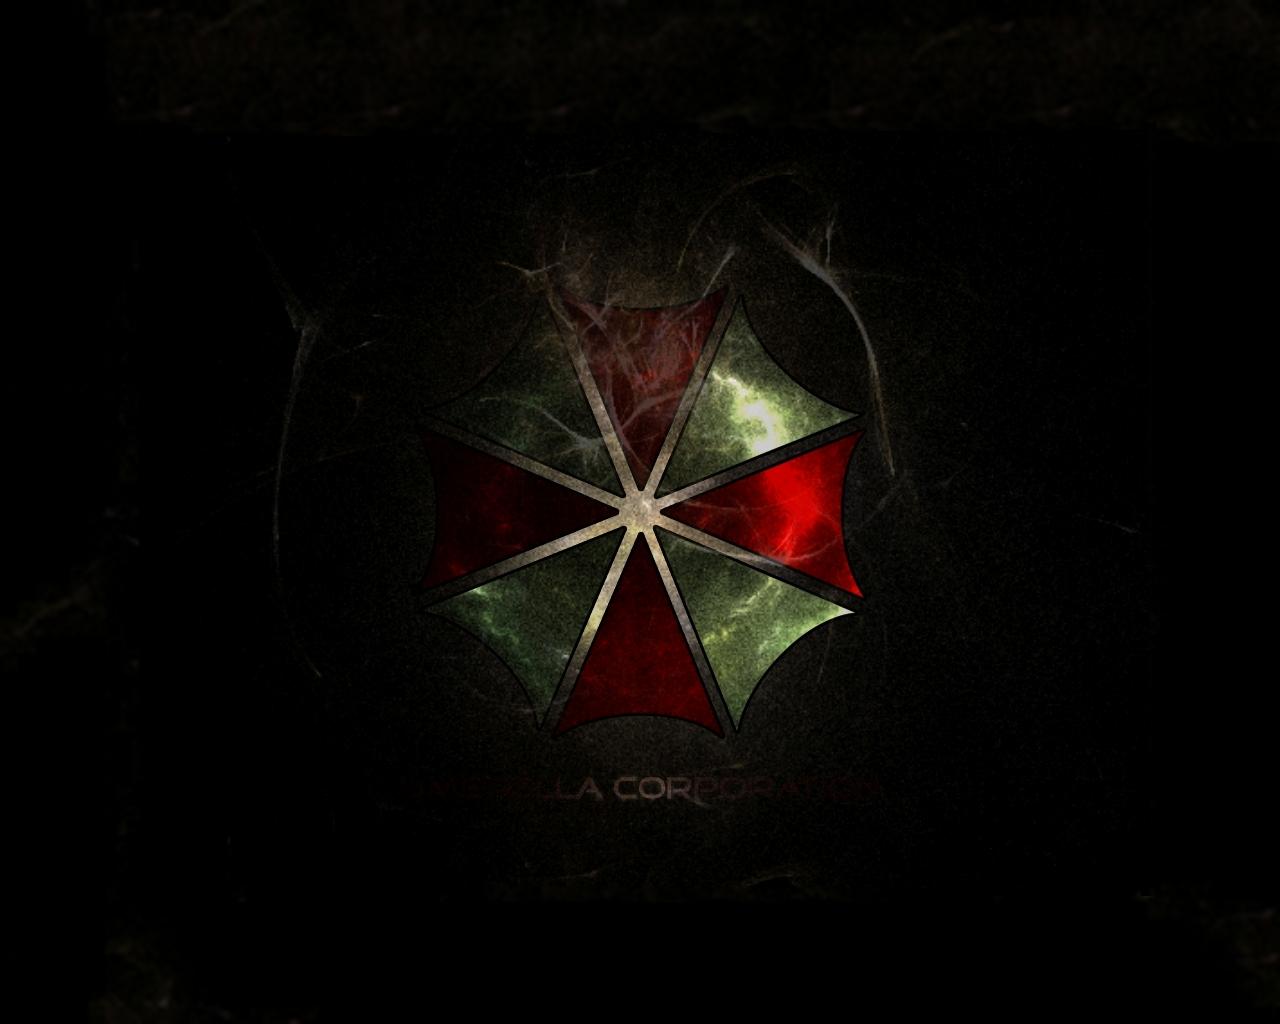 http://1.bp.blogspot.com/-l6UY3L7AZW4/UAkmTNTrGSI/AAAAAAAABsk/BhEFrbJSHiE/s1600/resident+evil+umbrella+corporation+title+logo+symbol+wallpaper+background+capcom+third+person+action+horror+shooter+game+(2).jpg